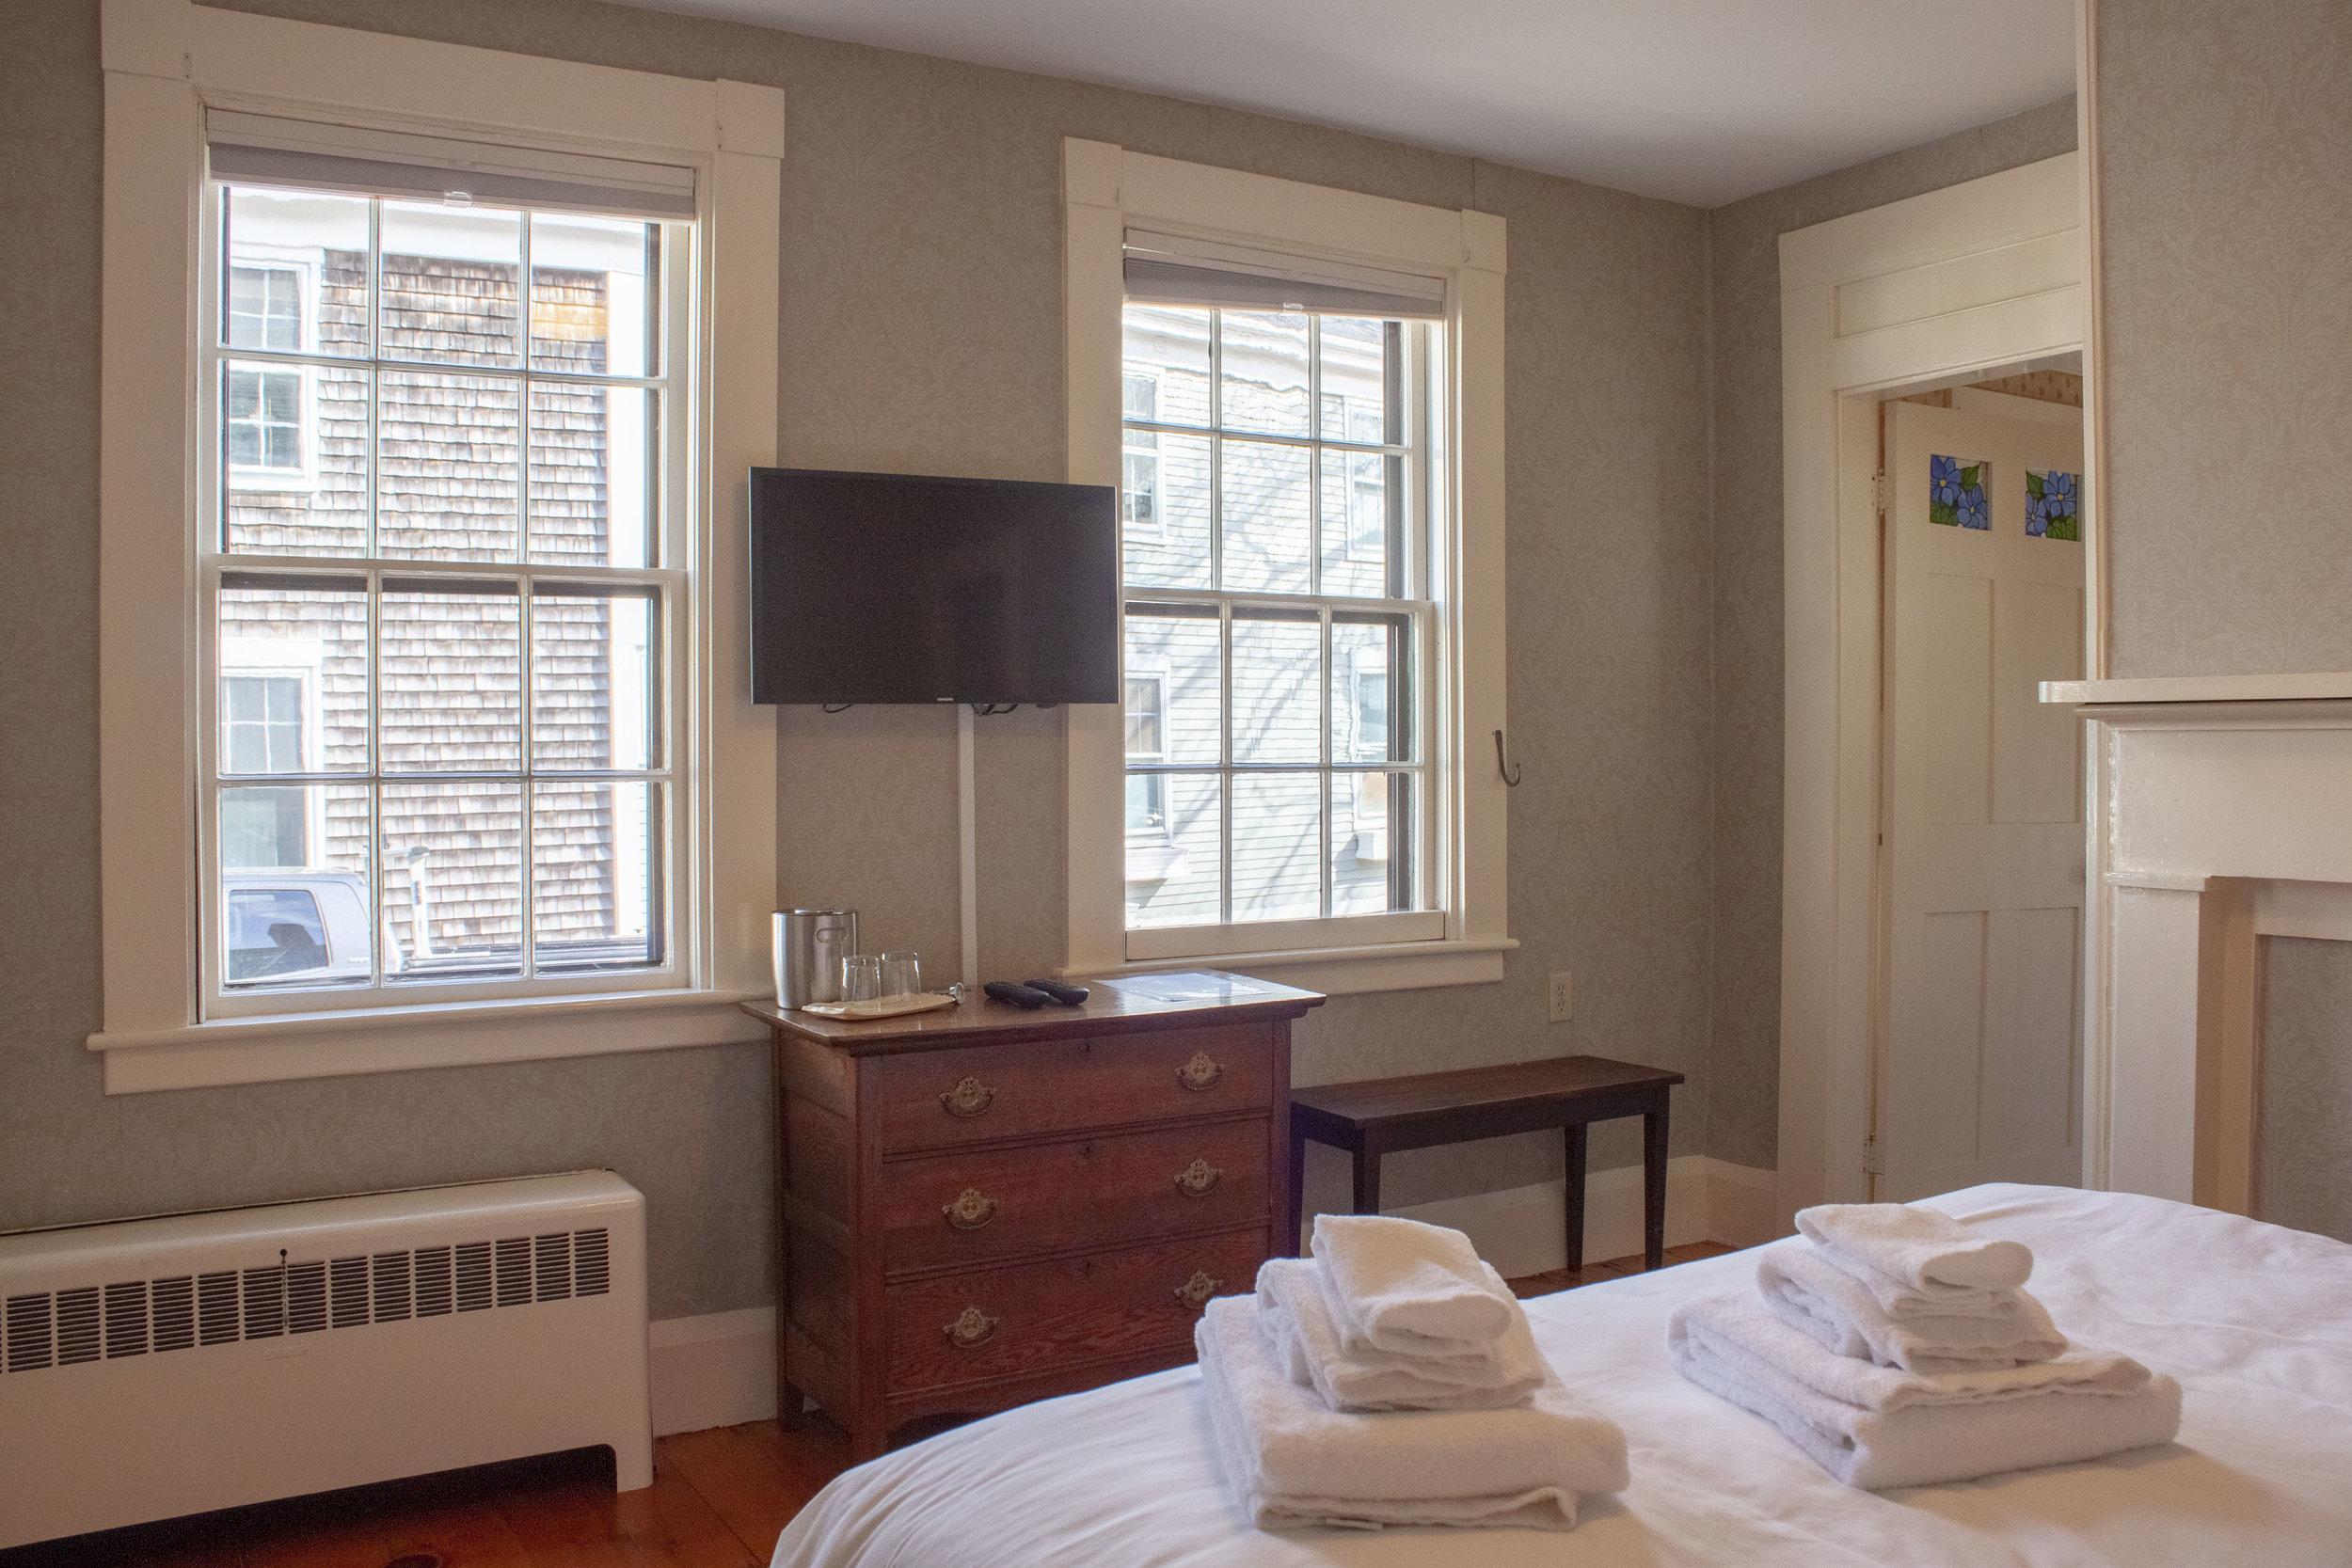 HH_Room1_3.jpg